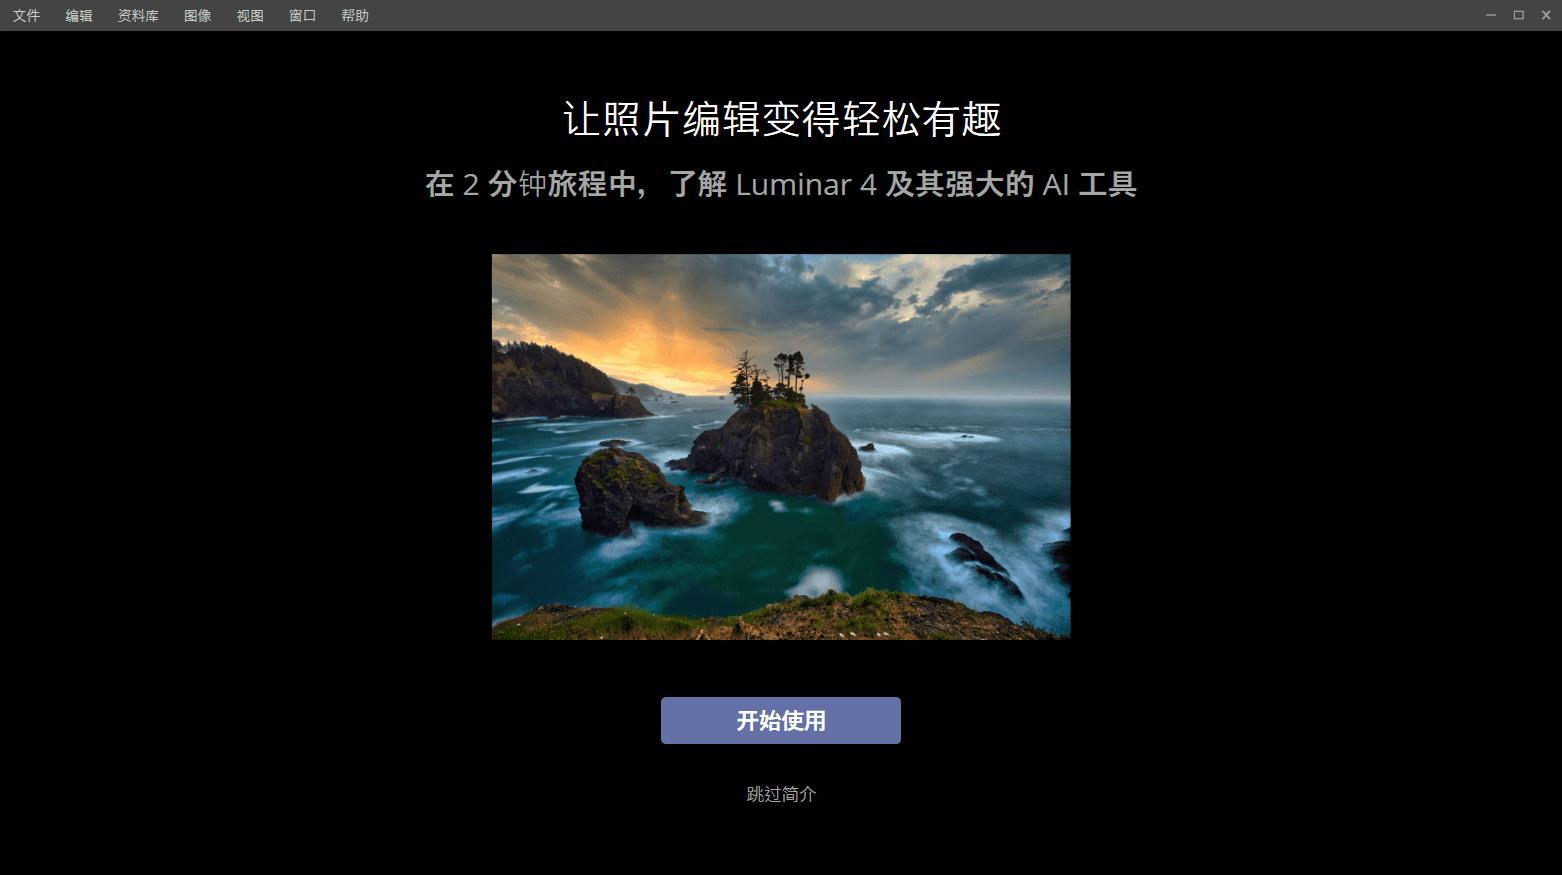 照片编辑器Luminar v4.3.0